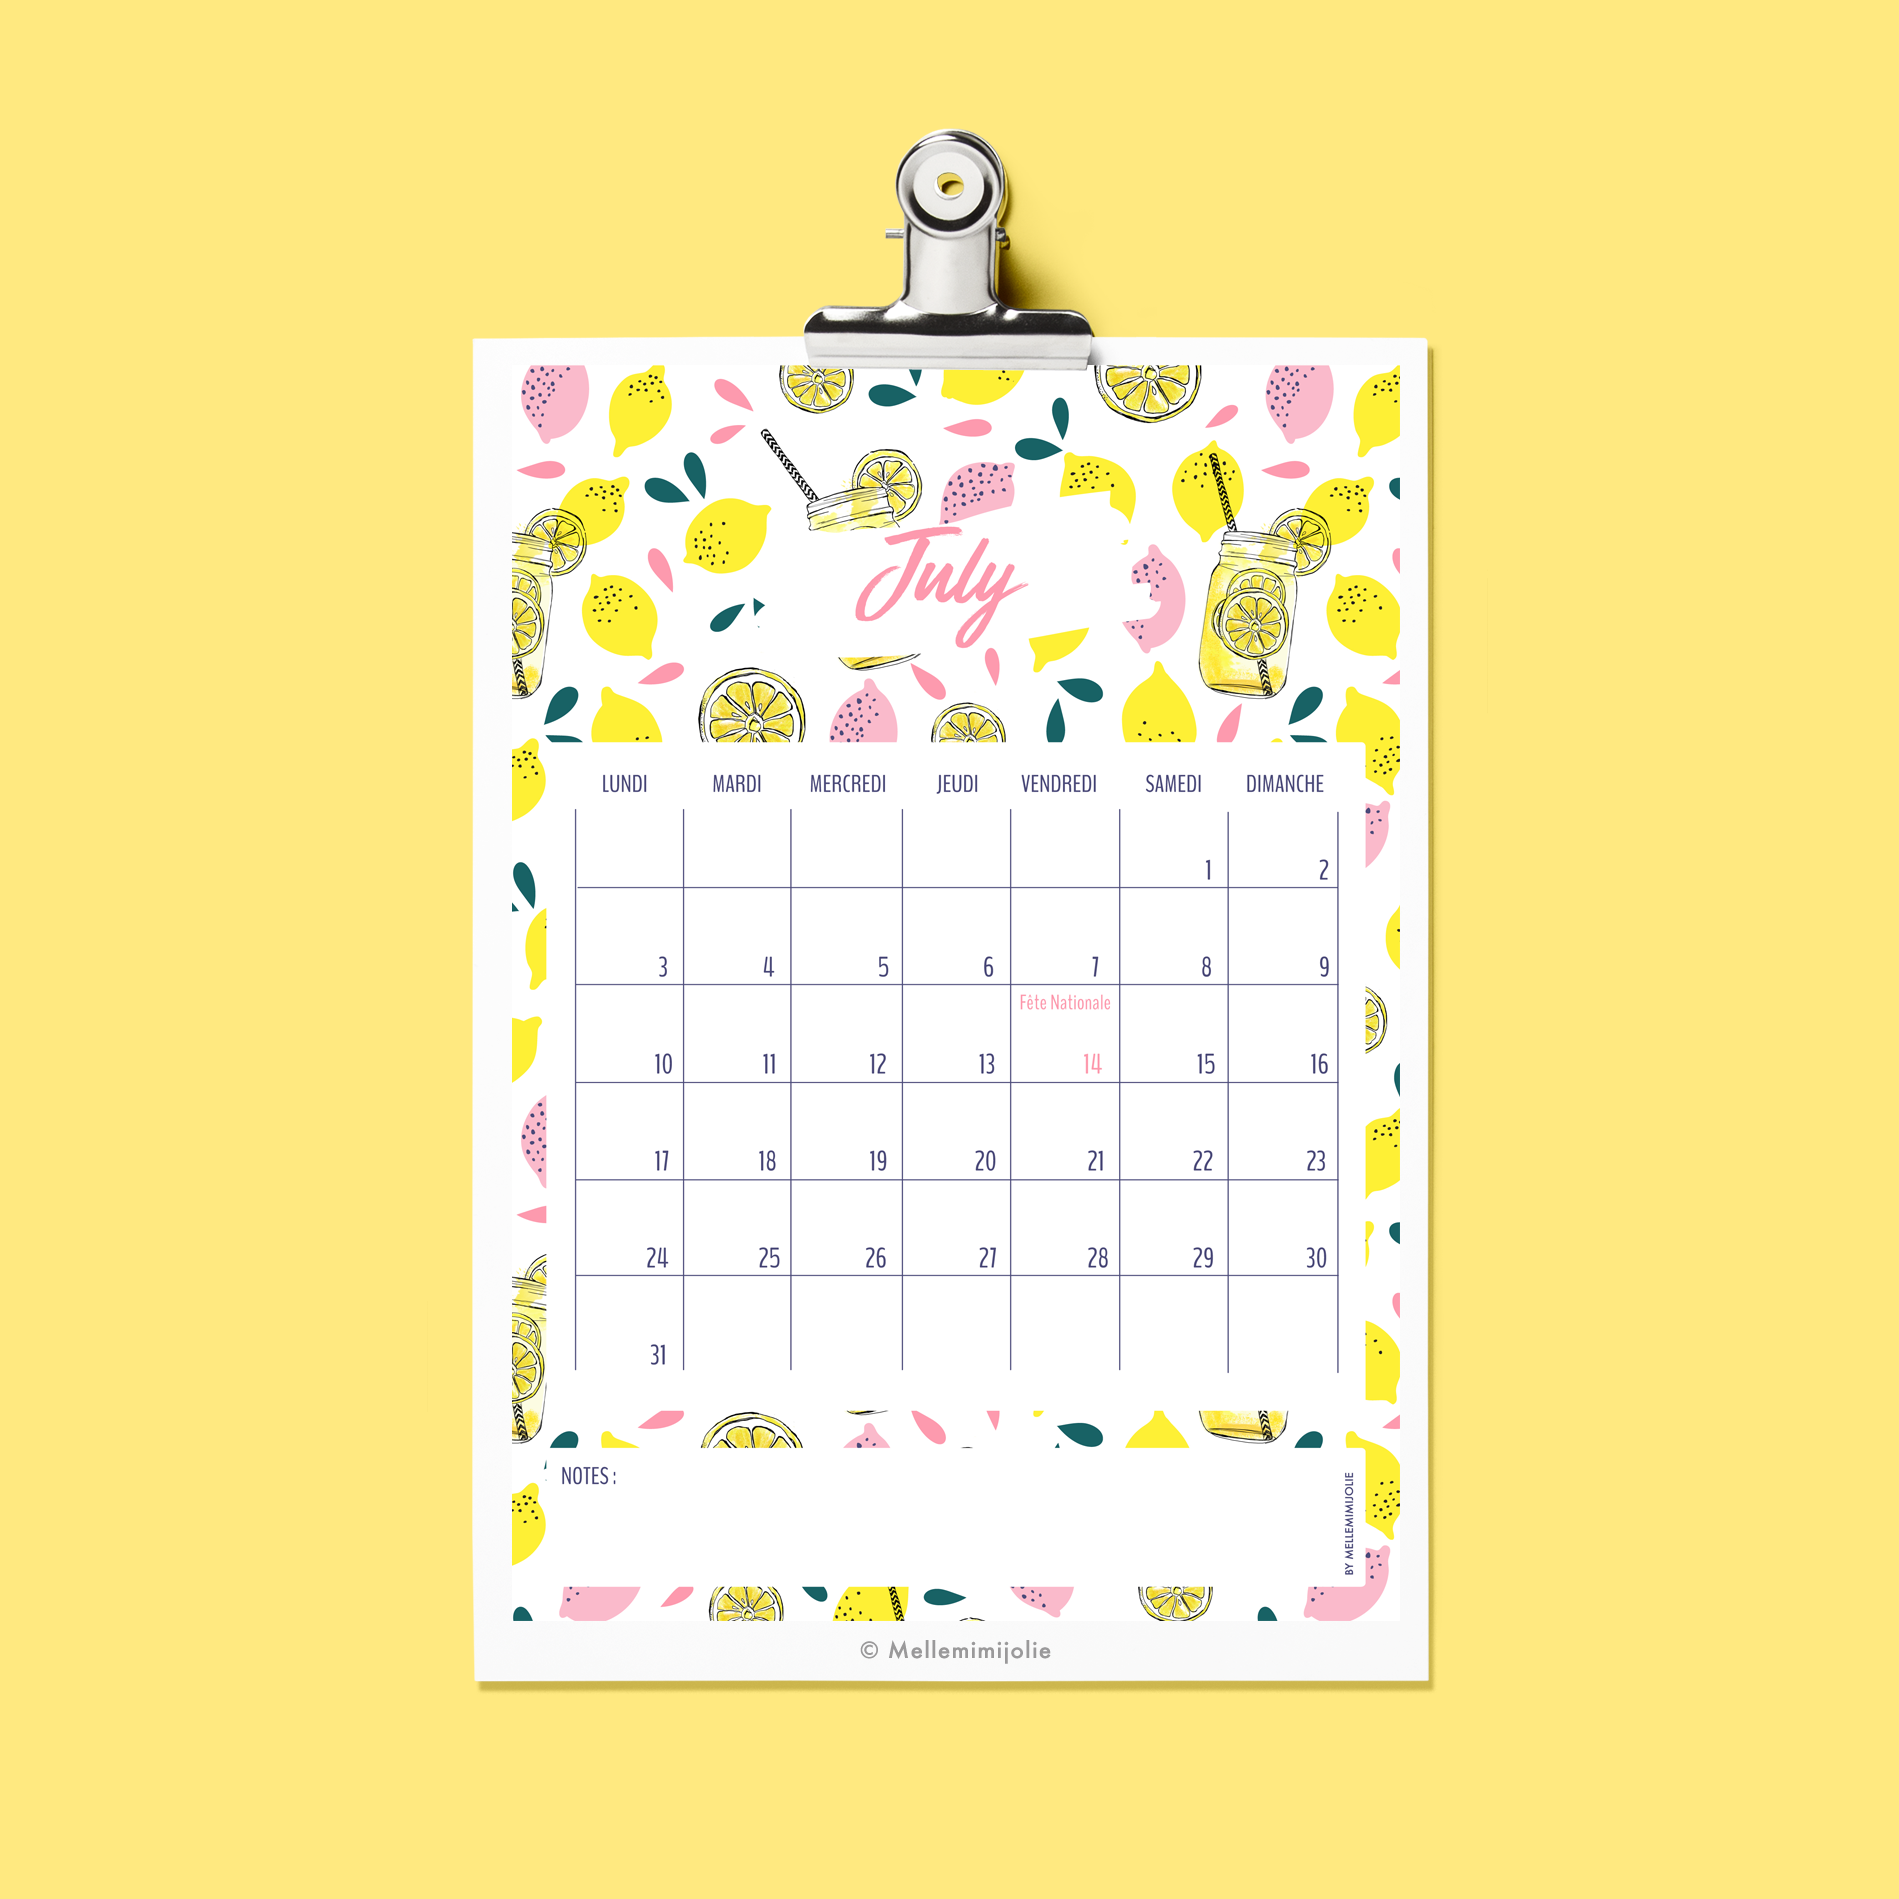 mellemimijolie-juillet-calendar